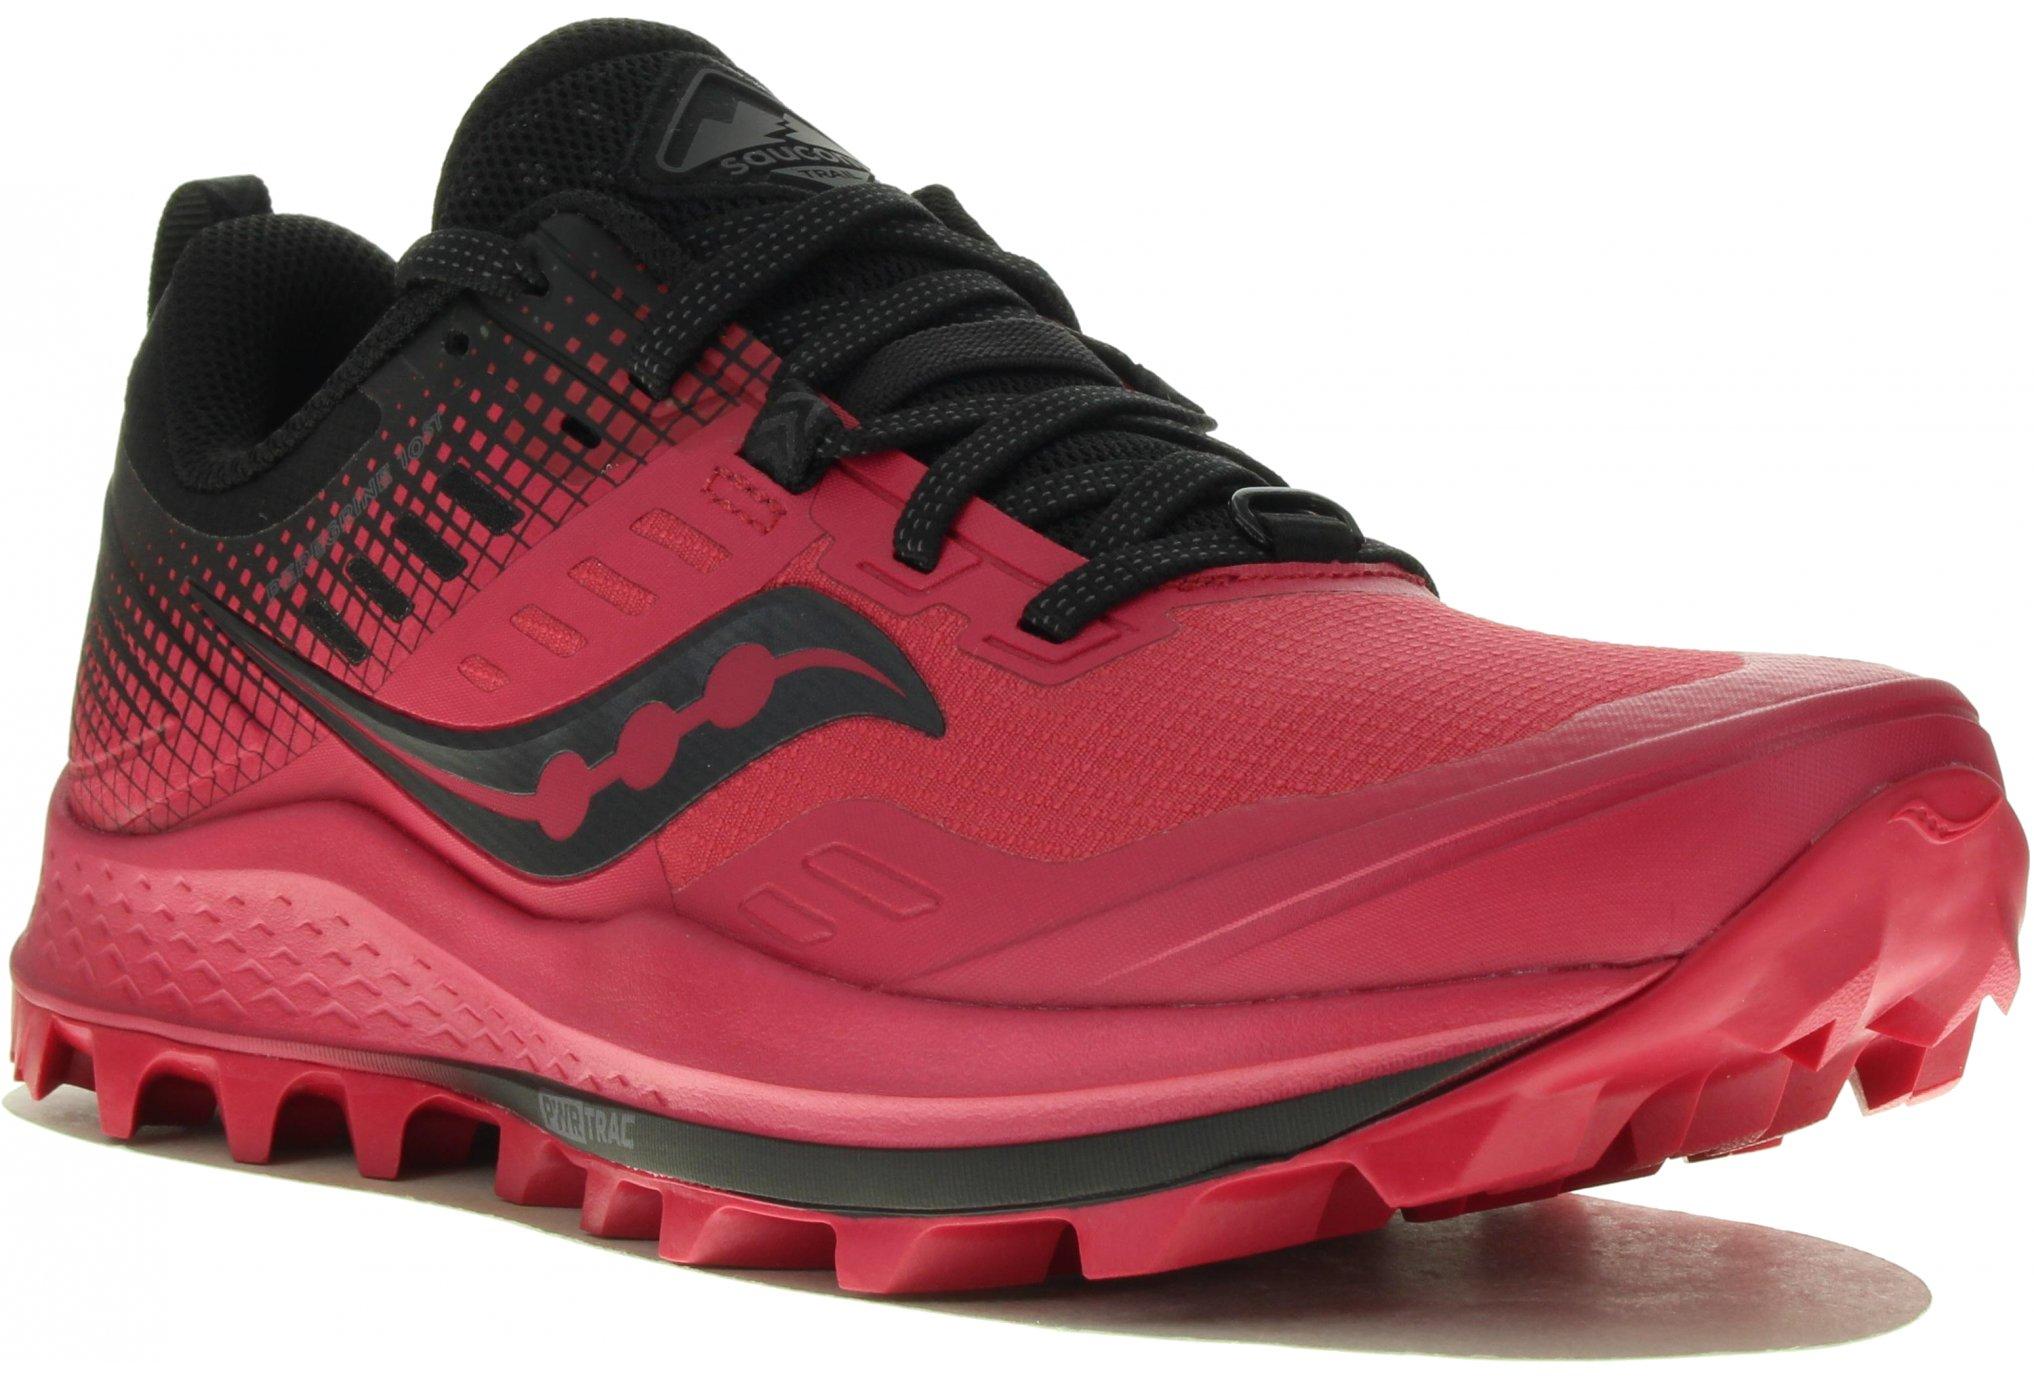 Saucony Peregrine 10 ST W Chaussures running femme